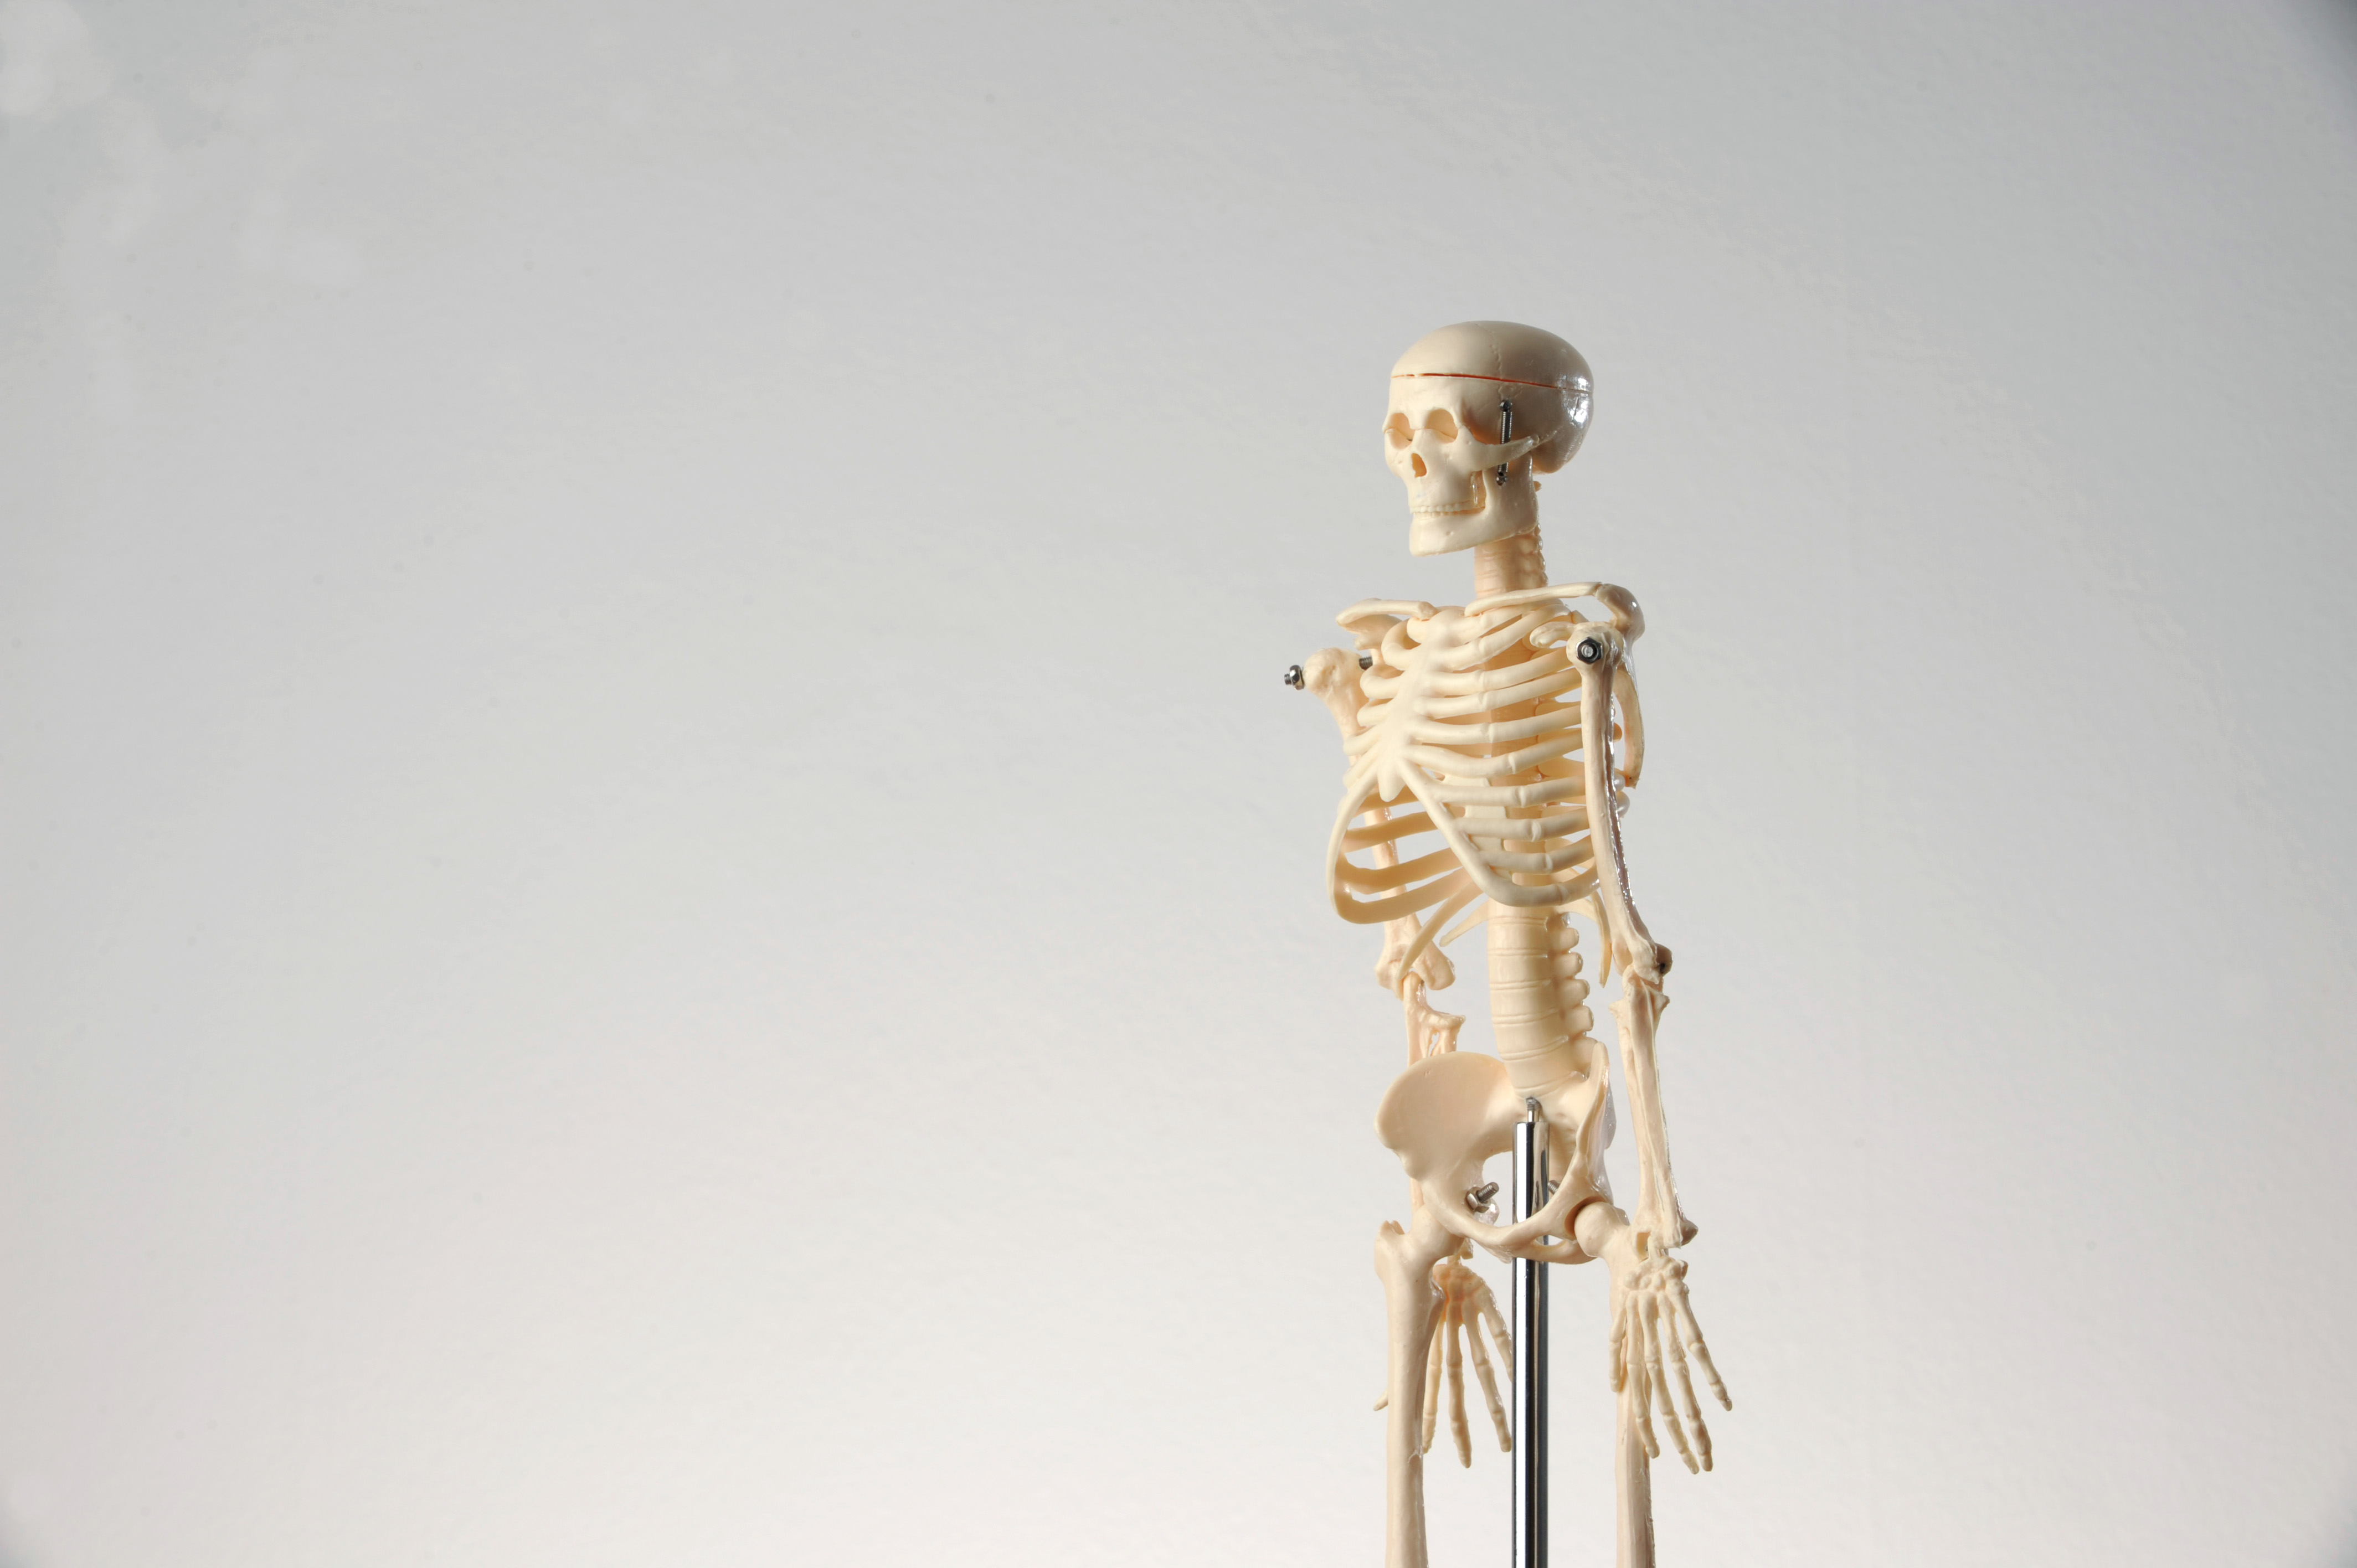 Erfreut Skelett Pic Fotos - Anatomie Ideen - finotti.info